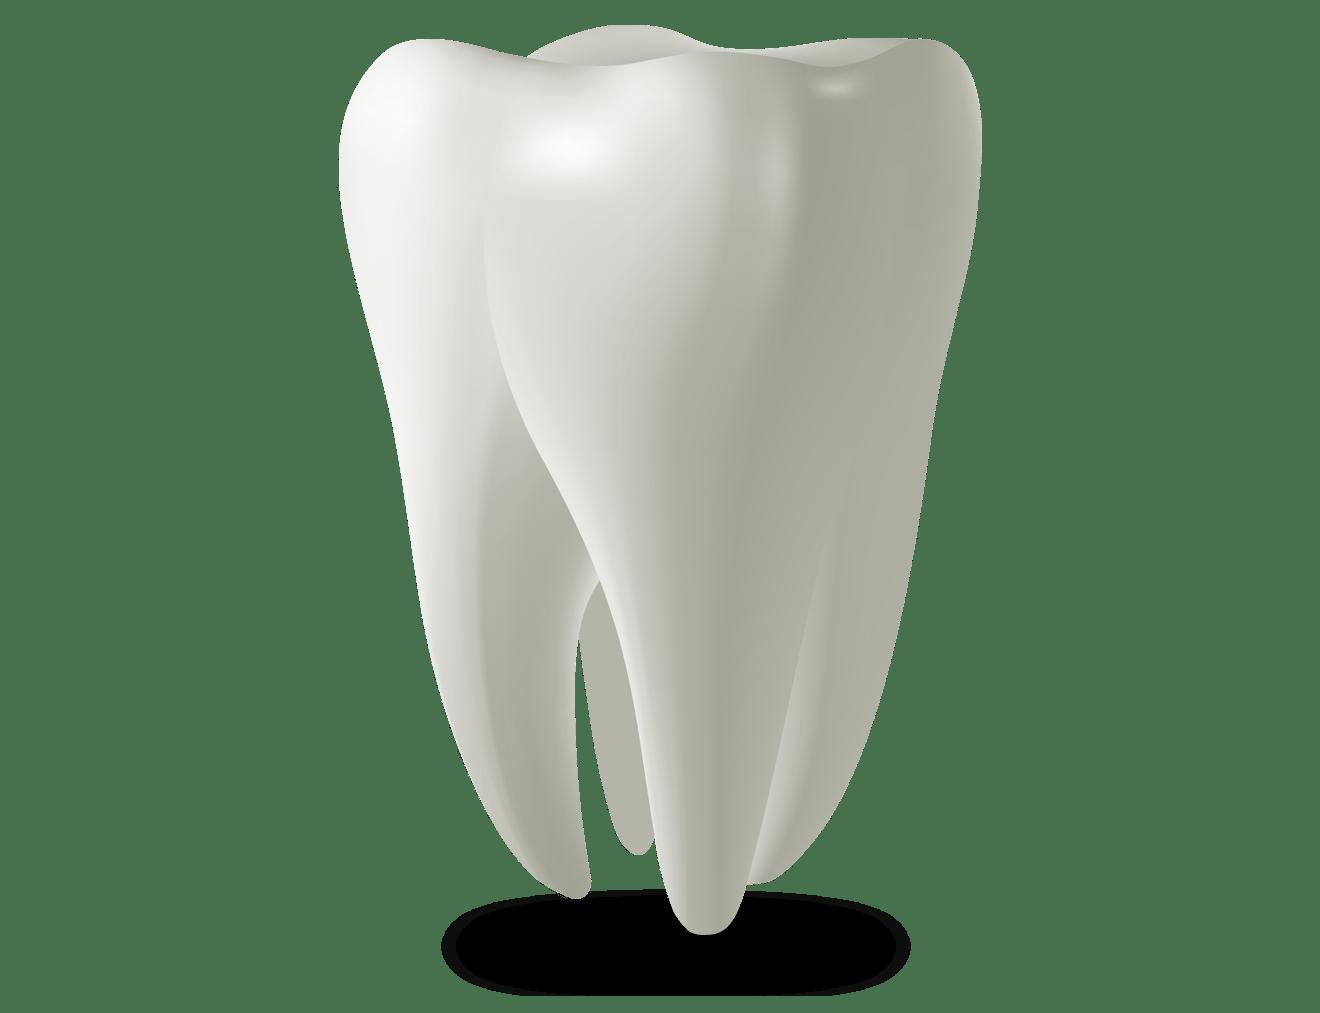 tooth model Falls Church, VA